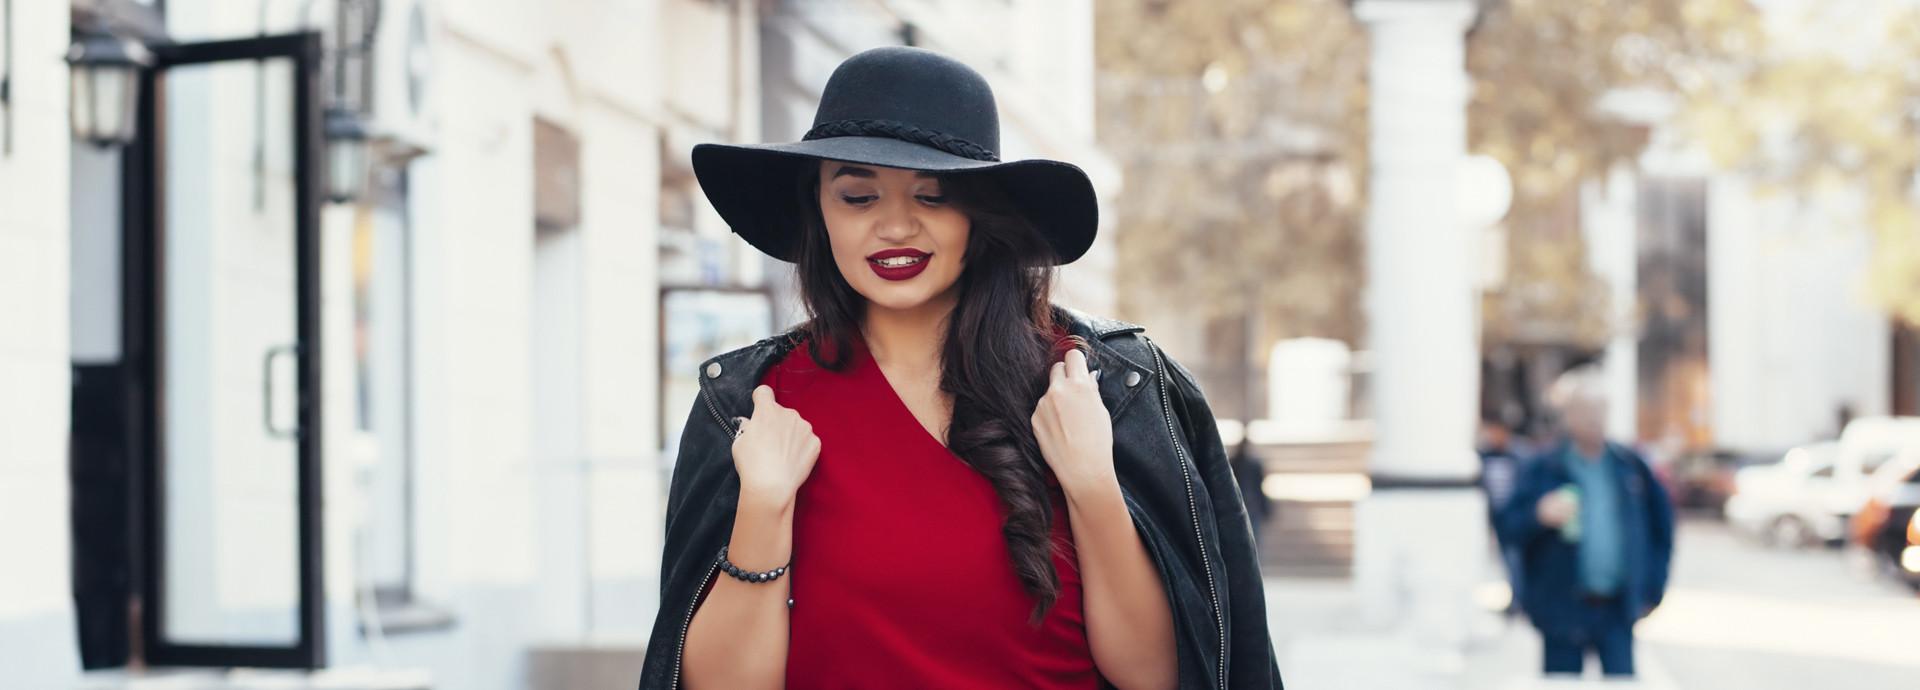 Carrefour Charlesbourg - Mode femme